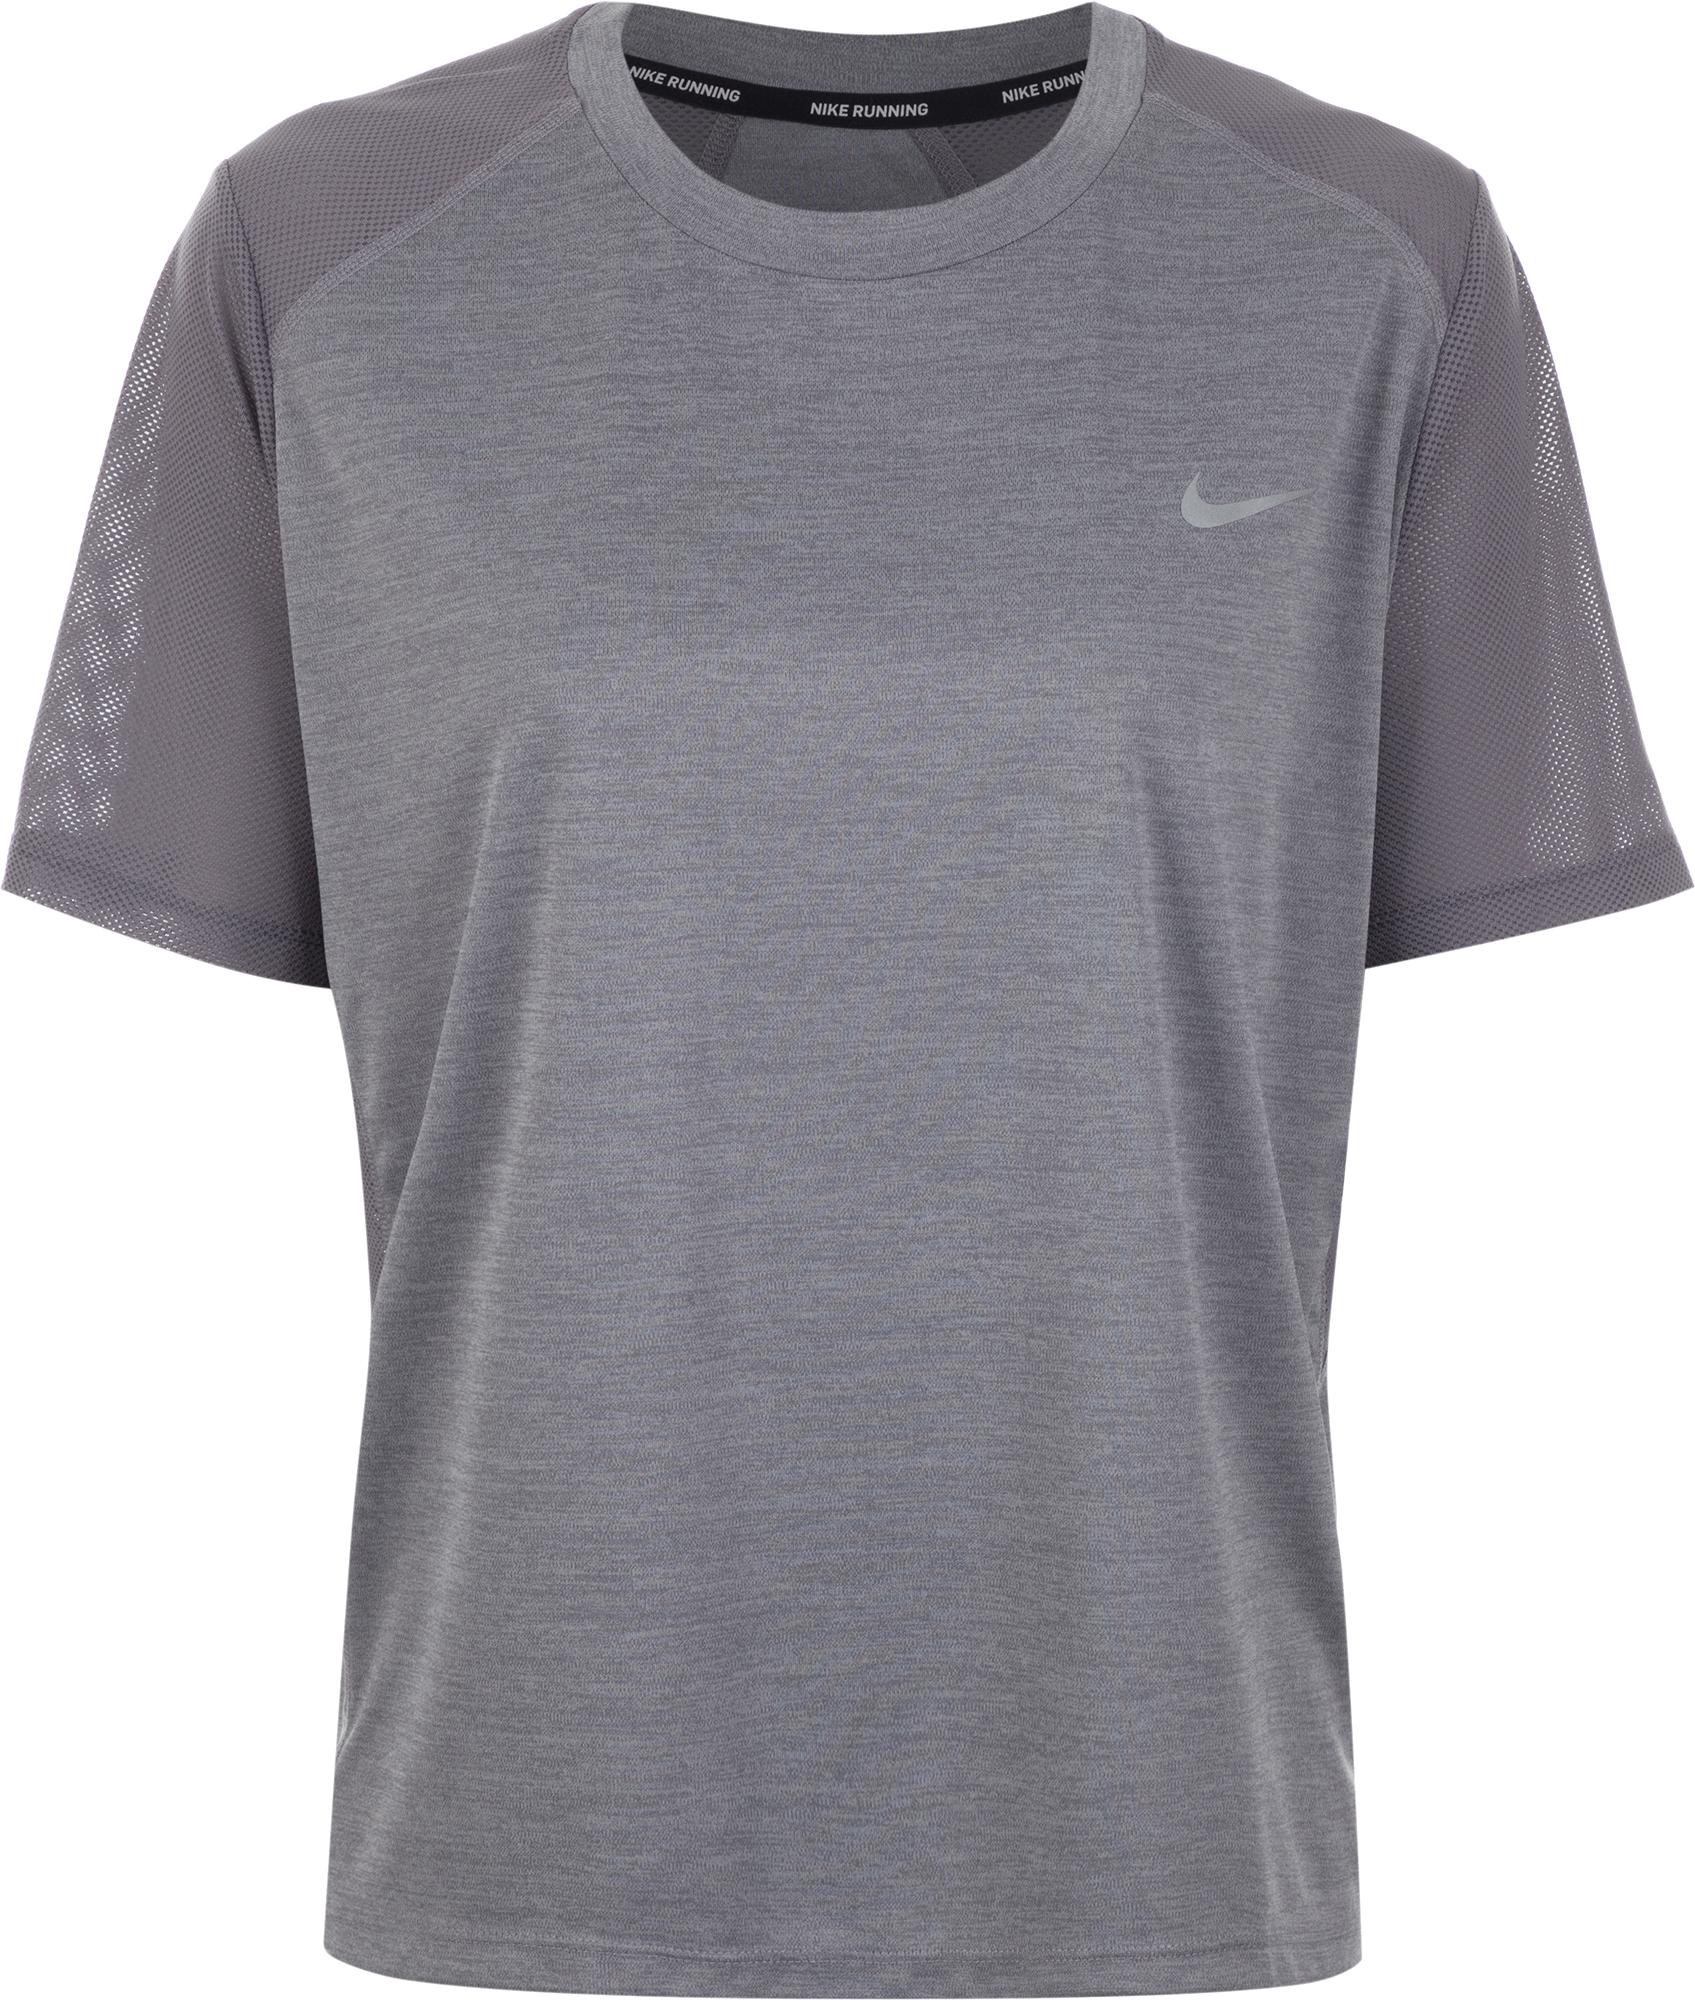 Nike Футболка женская Nike Miler, размер 56-58 nike футболка женская nike miler размер 42 44